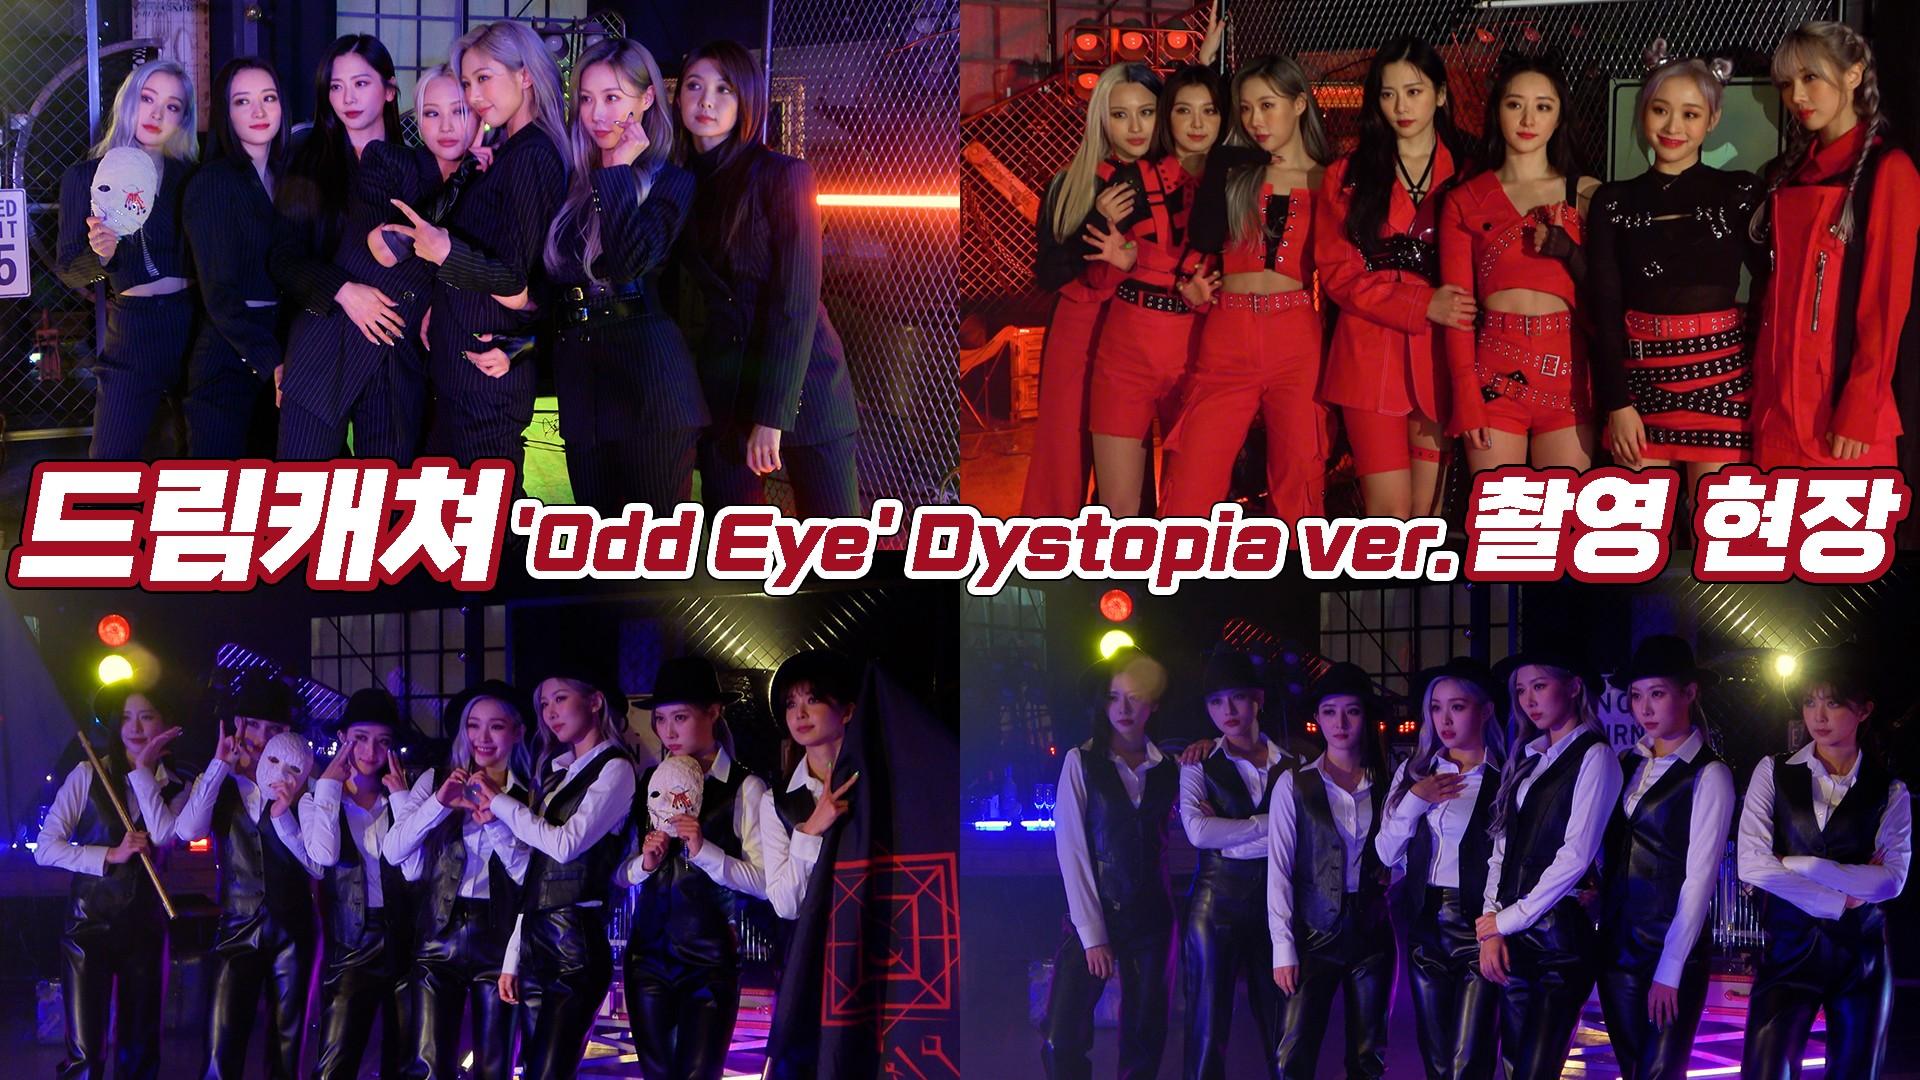 [Dreamcatcher's Note] 'Odd Eye' (Dystopia ver.) 촬영 현장